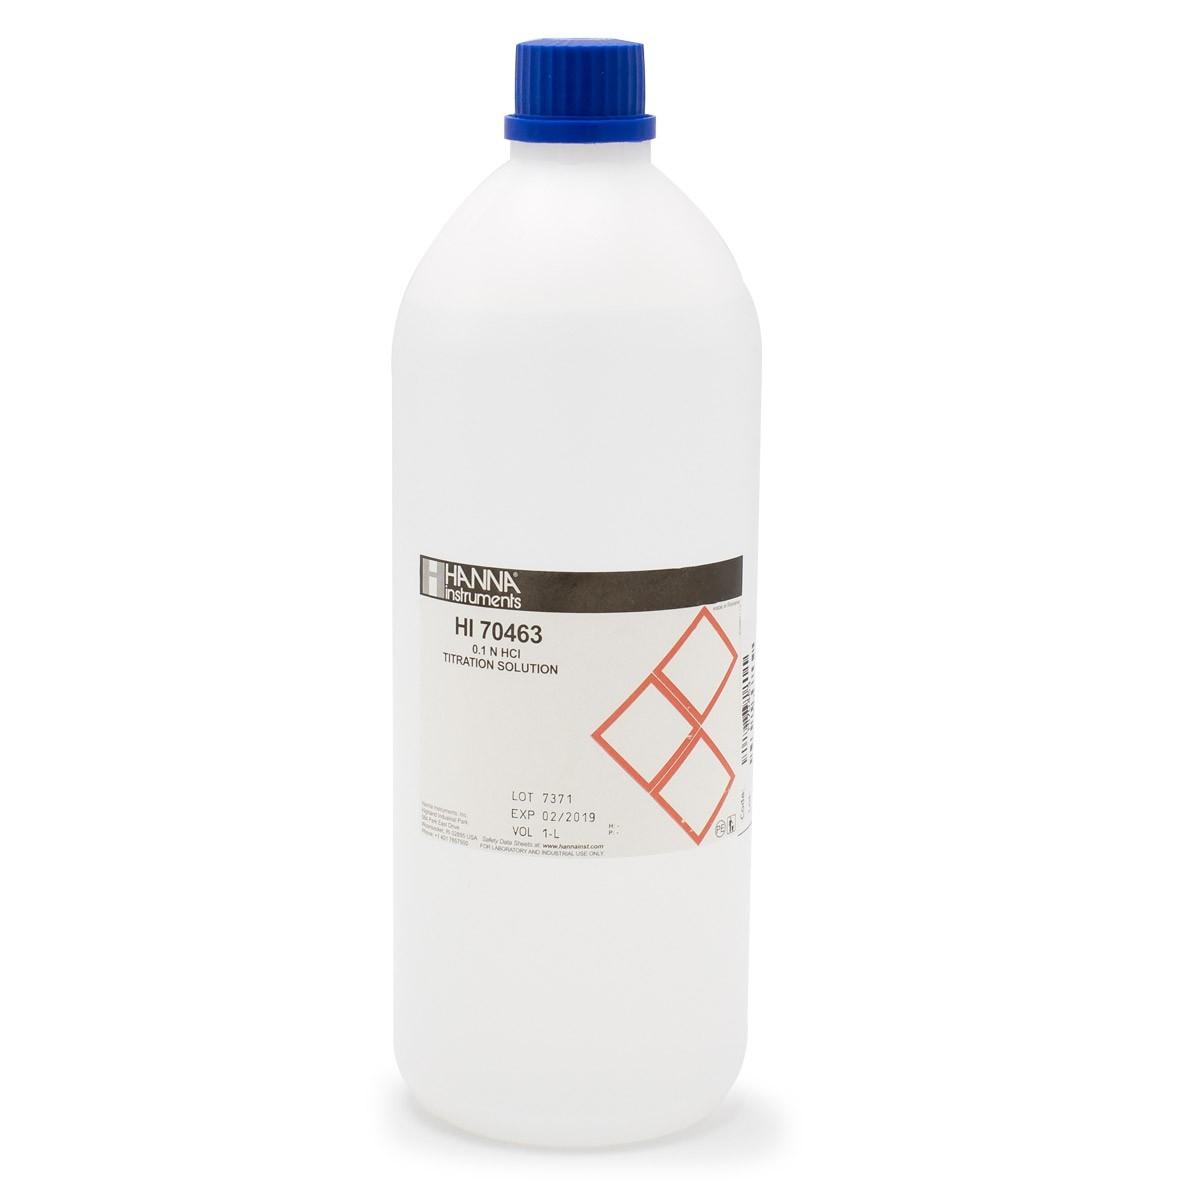 Hydrochloric Acid 0.1N, 1L - HI70463